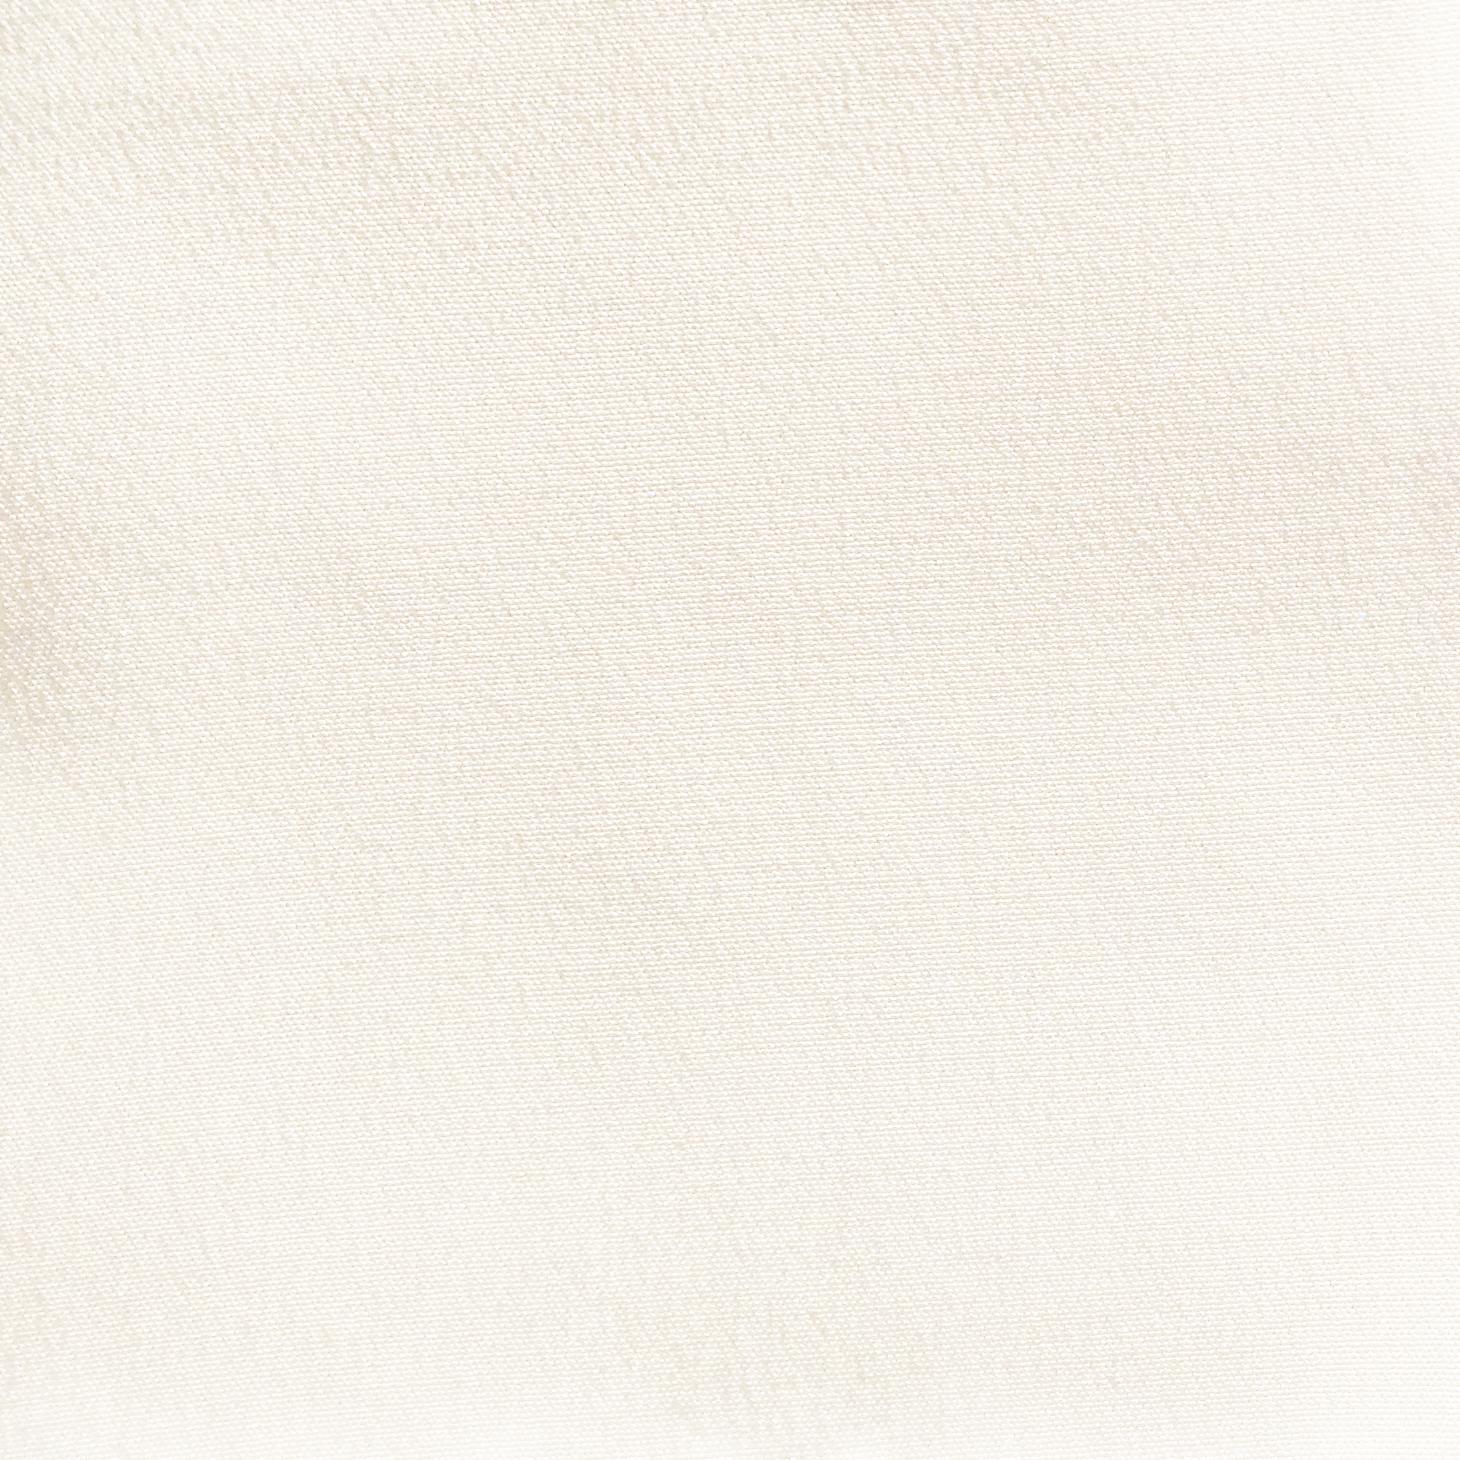 IEL | Curtain & Pillow   350 €/m2